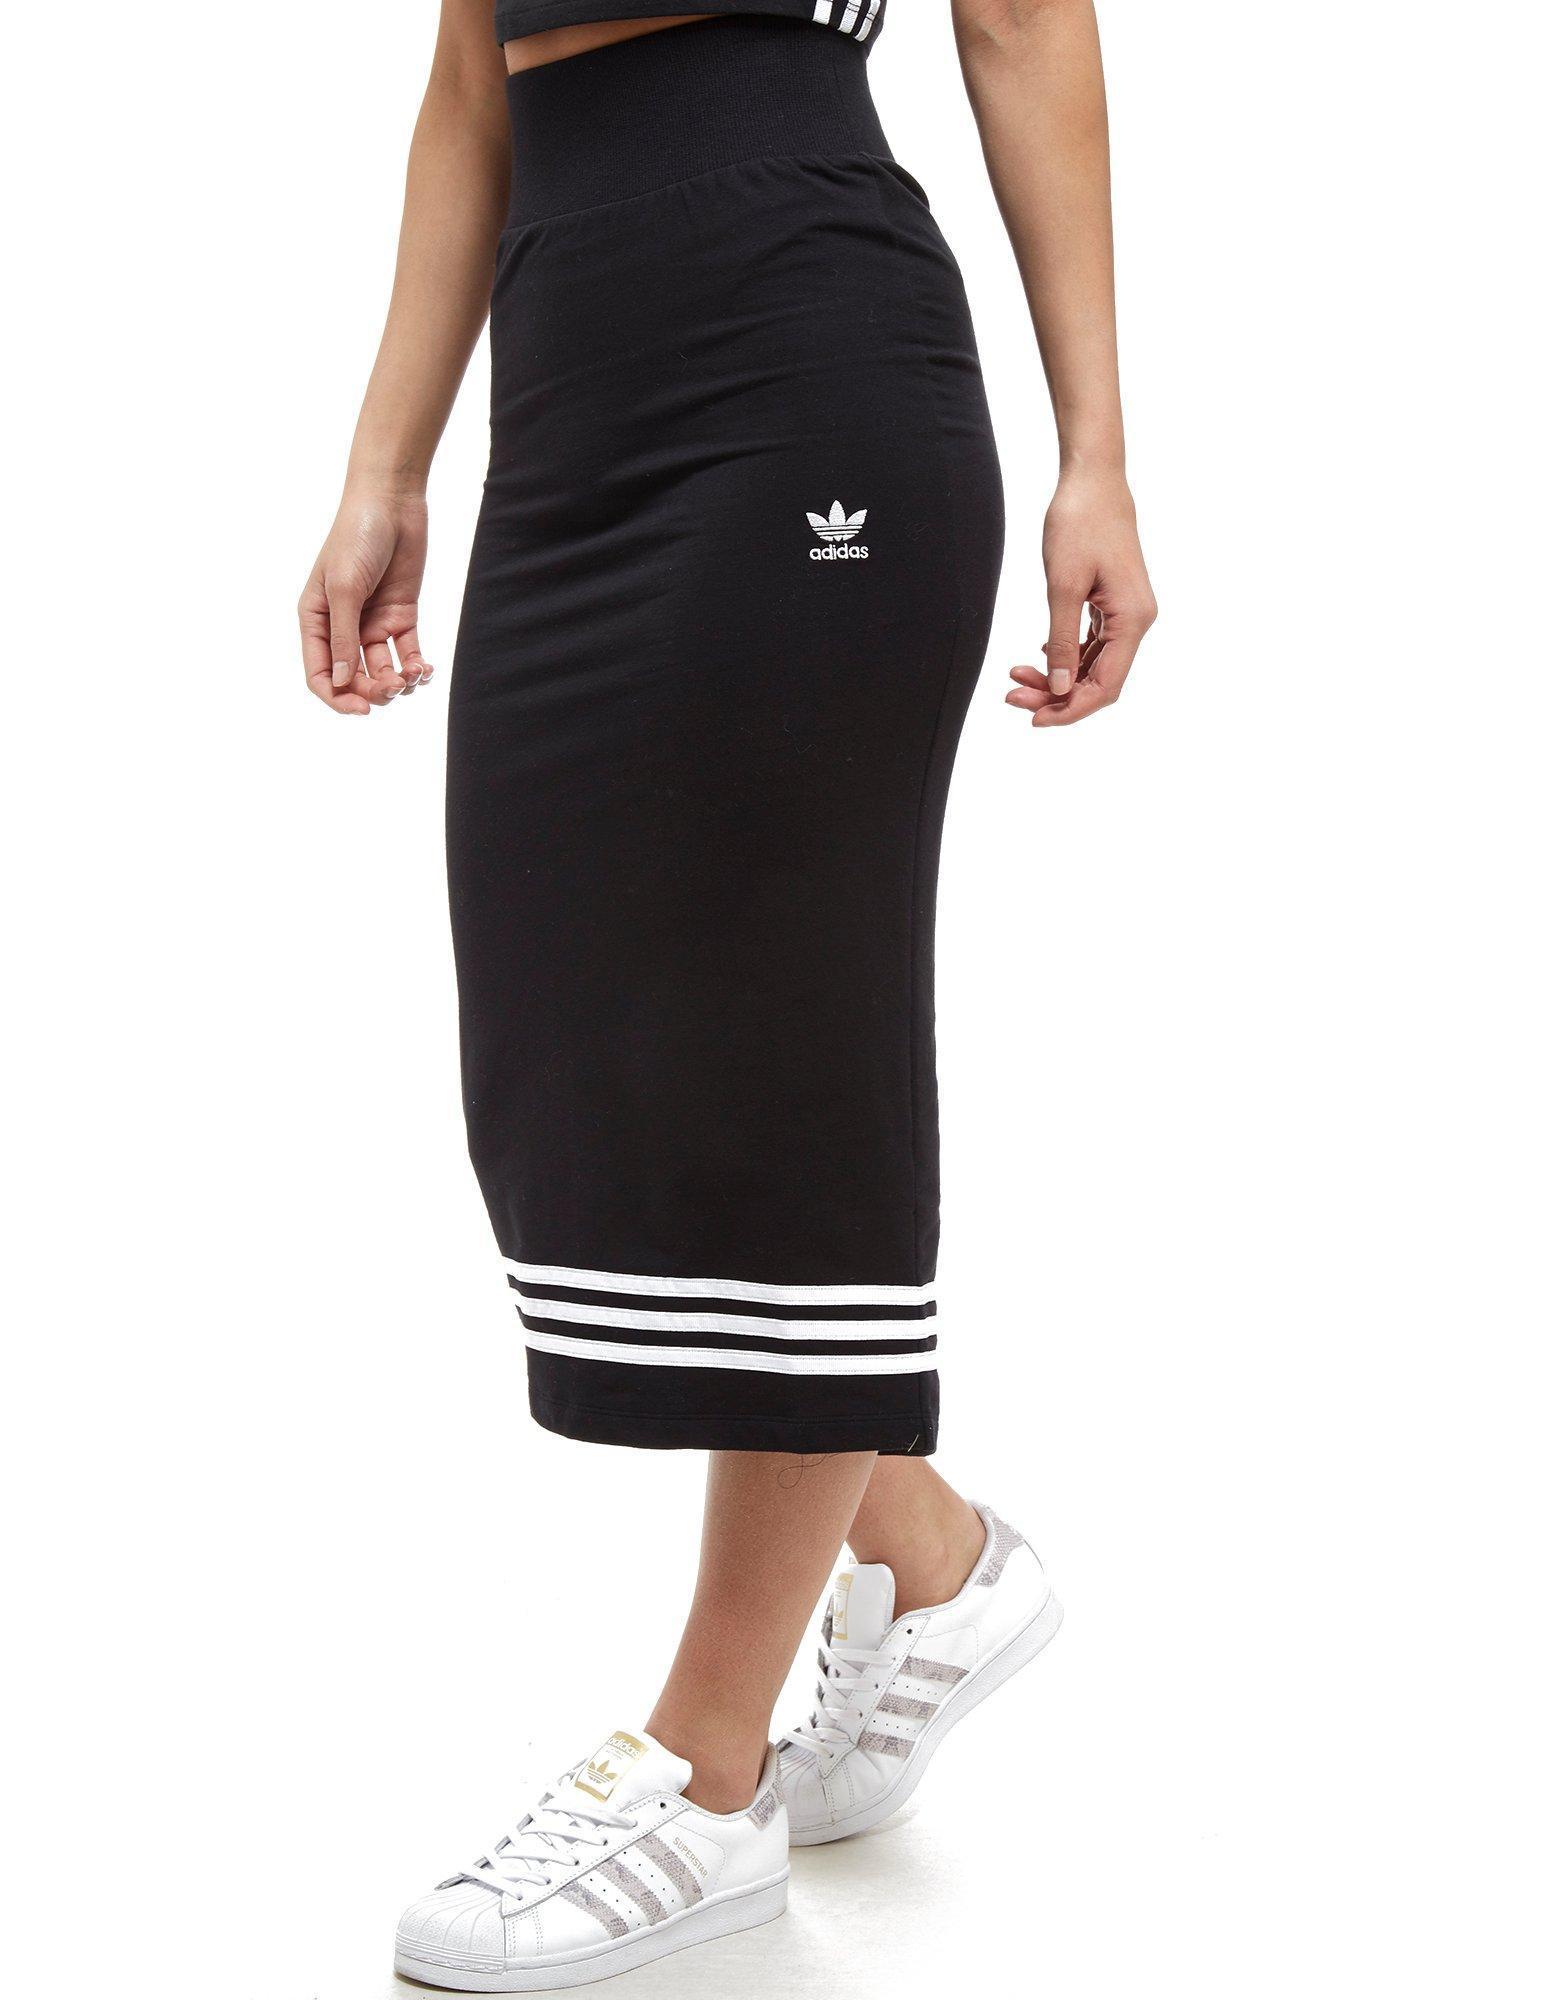 72b4e94474 adidas Originals 3-stripes Midi Skirt in Black - Lyst